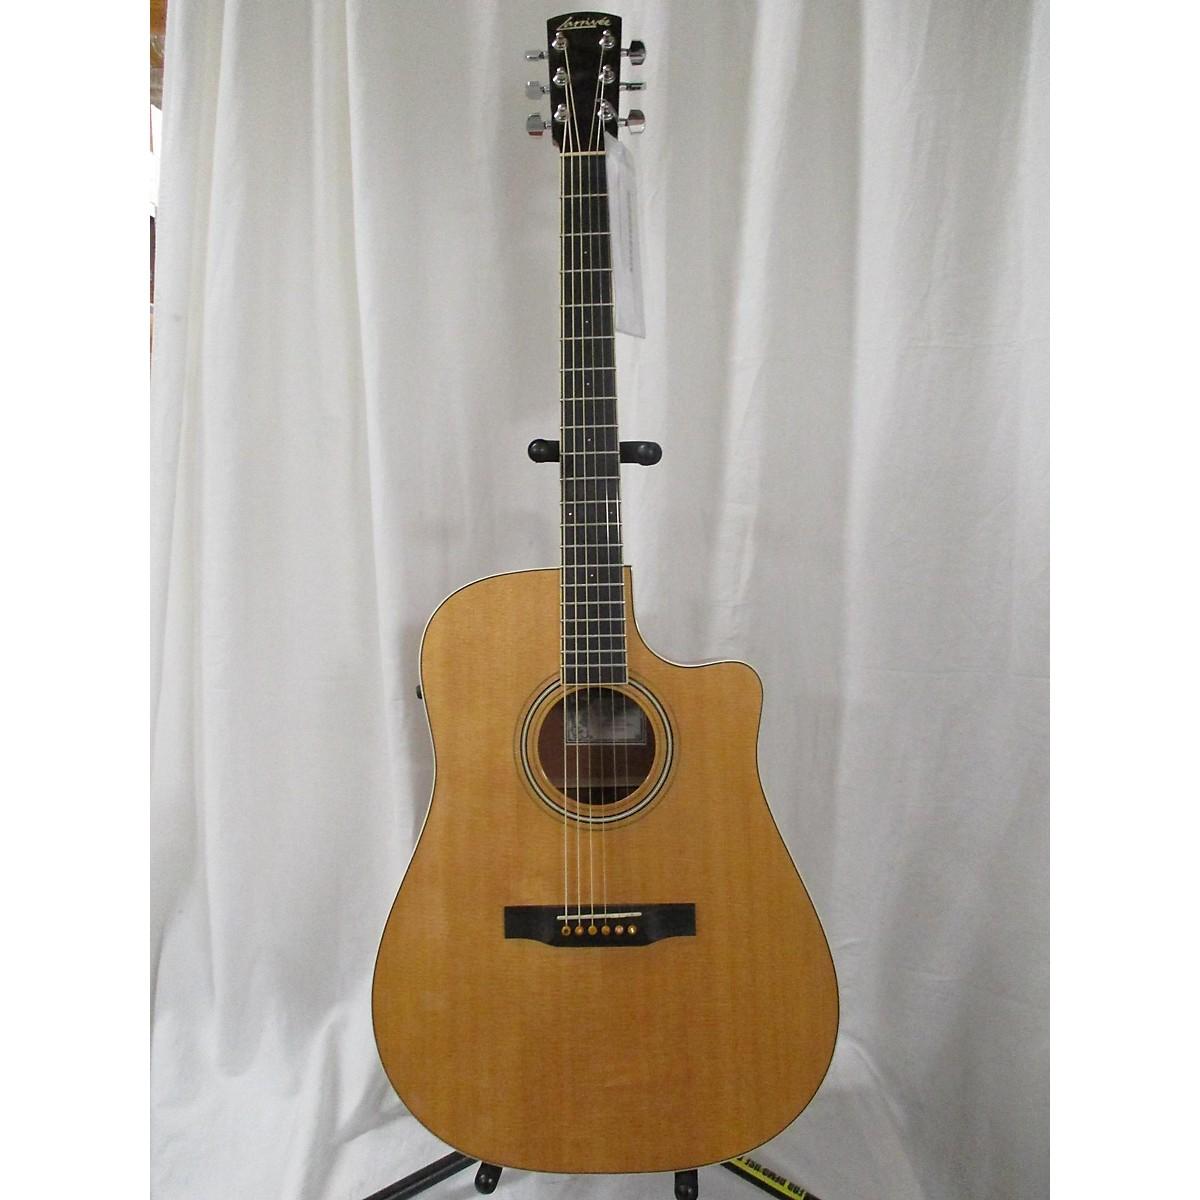 Larrivee DV-04 Acoustic Electric Guitar